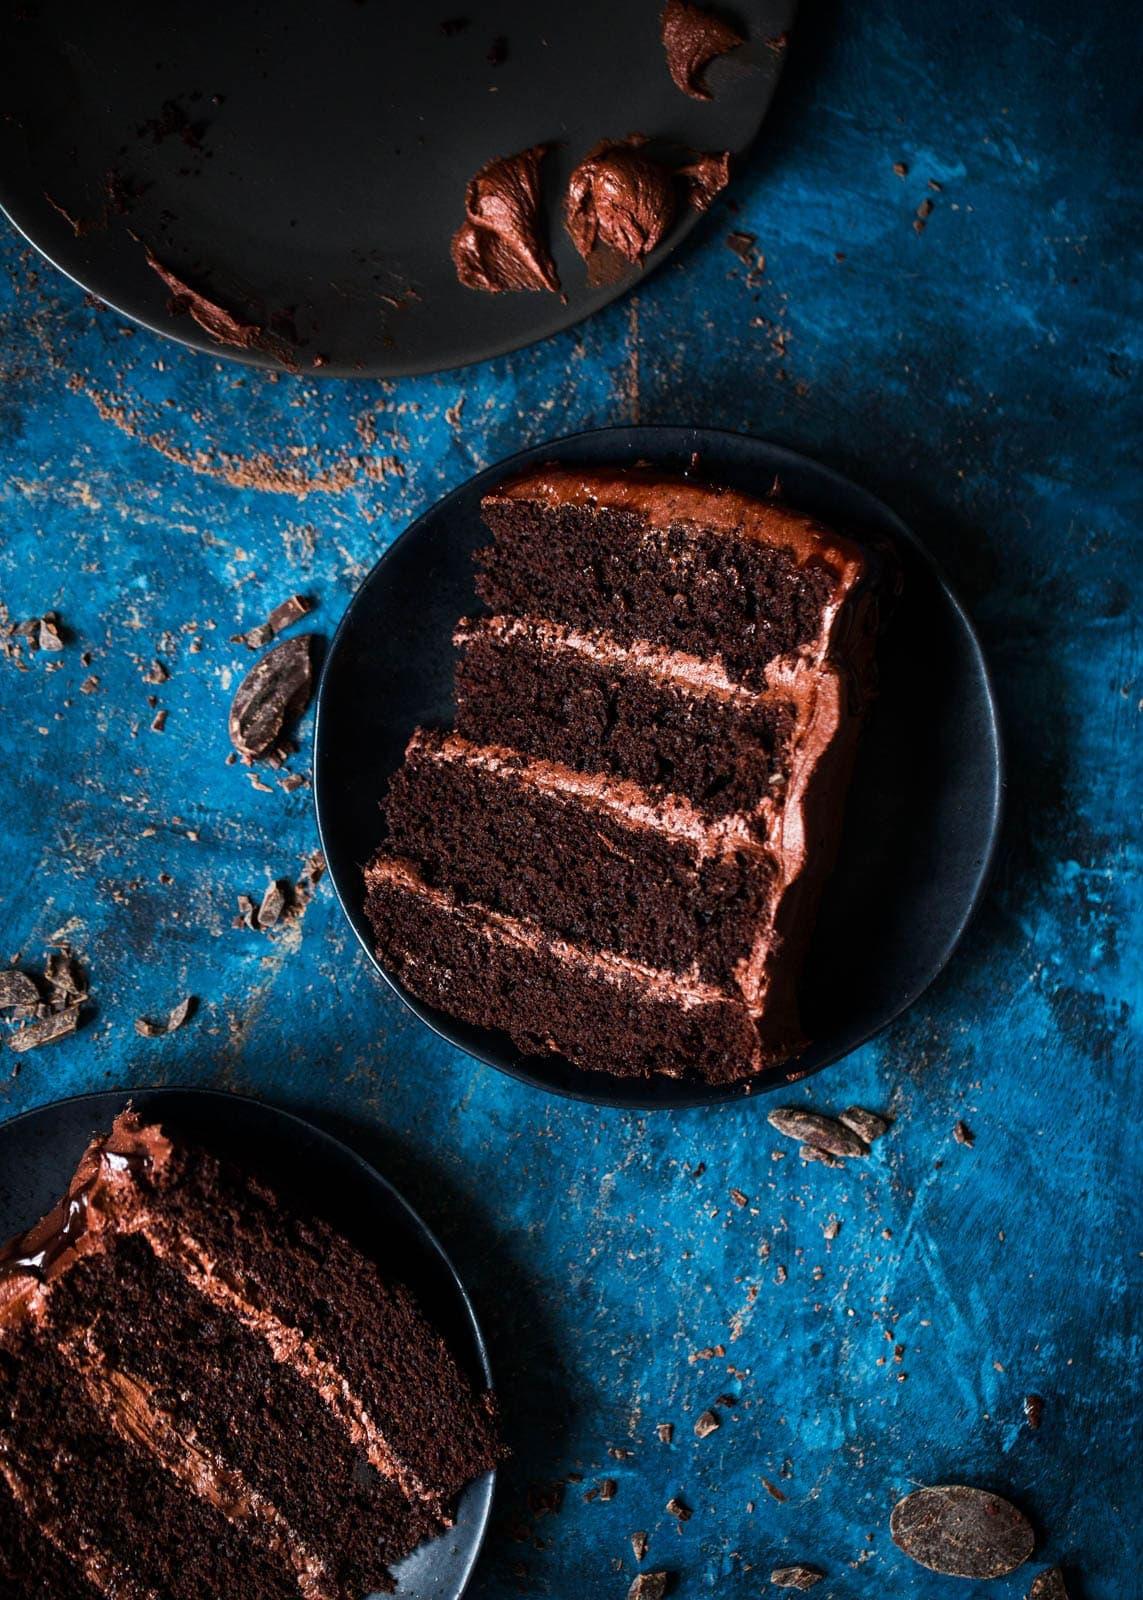 slices of Chocolate Mocha Cake on plates